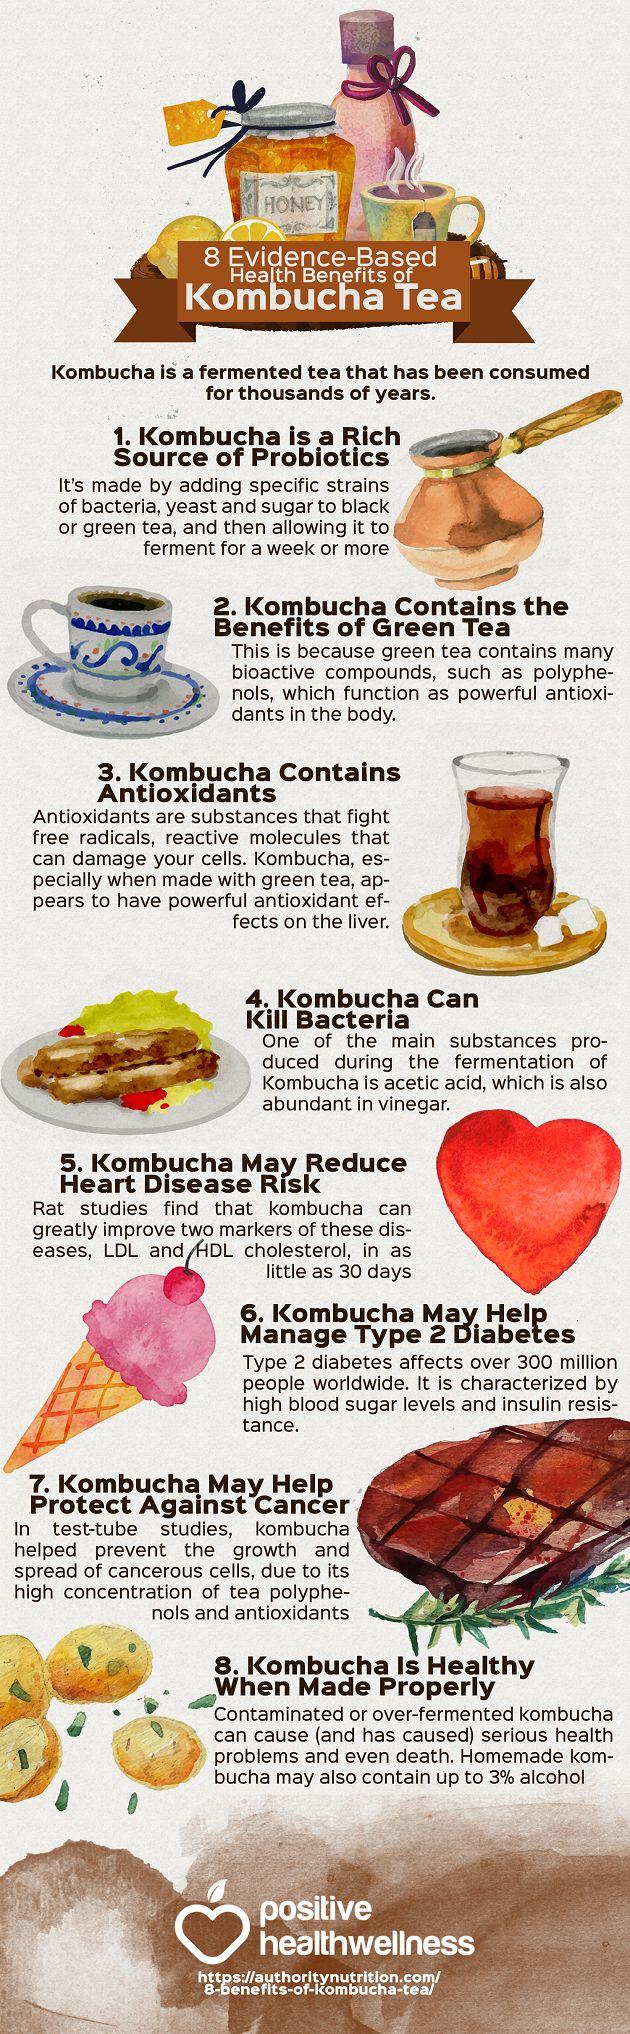 healthyhomosapien: 8 Evidence-Based Health Benefits of Kombucha Tea